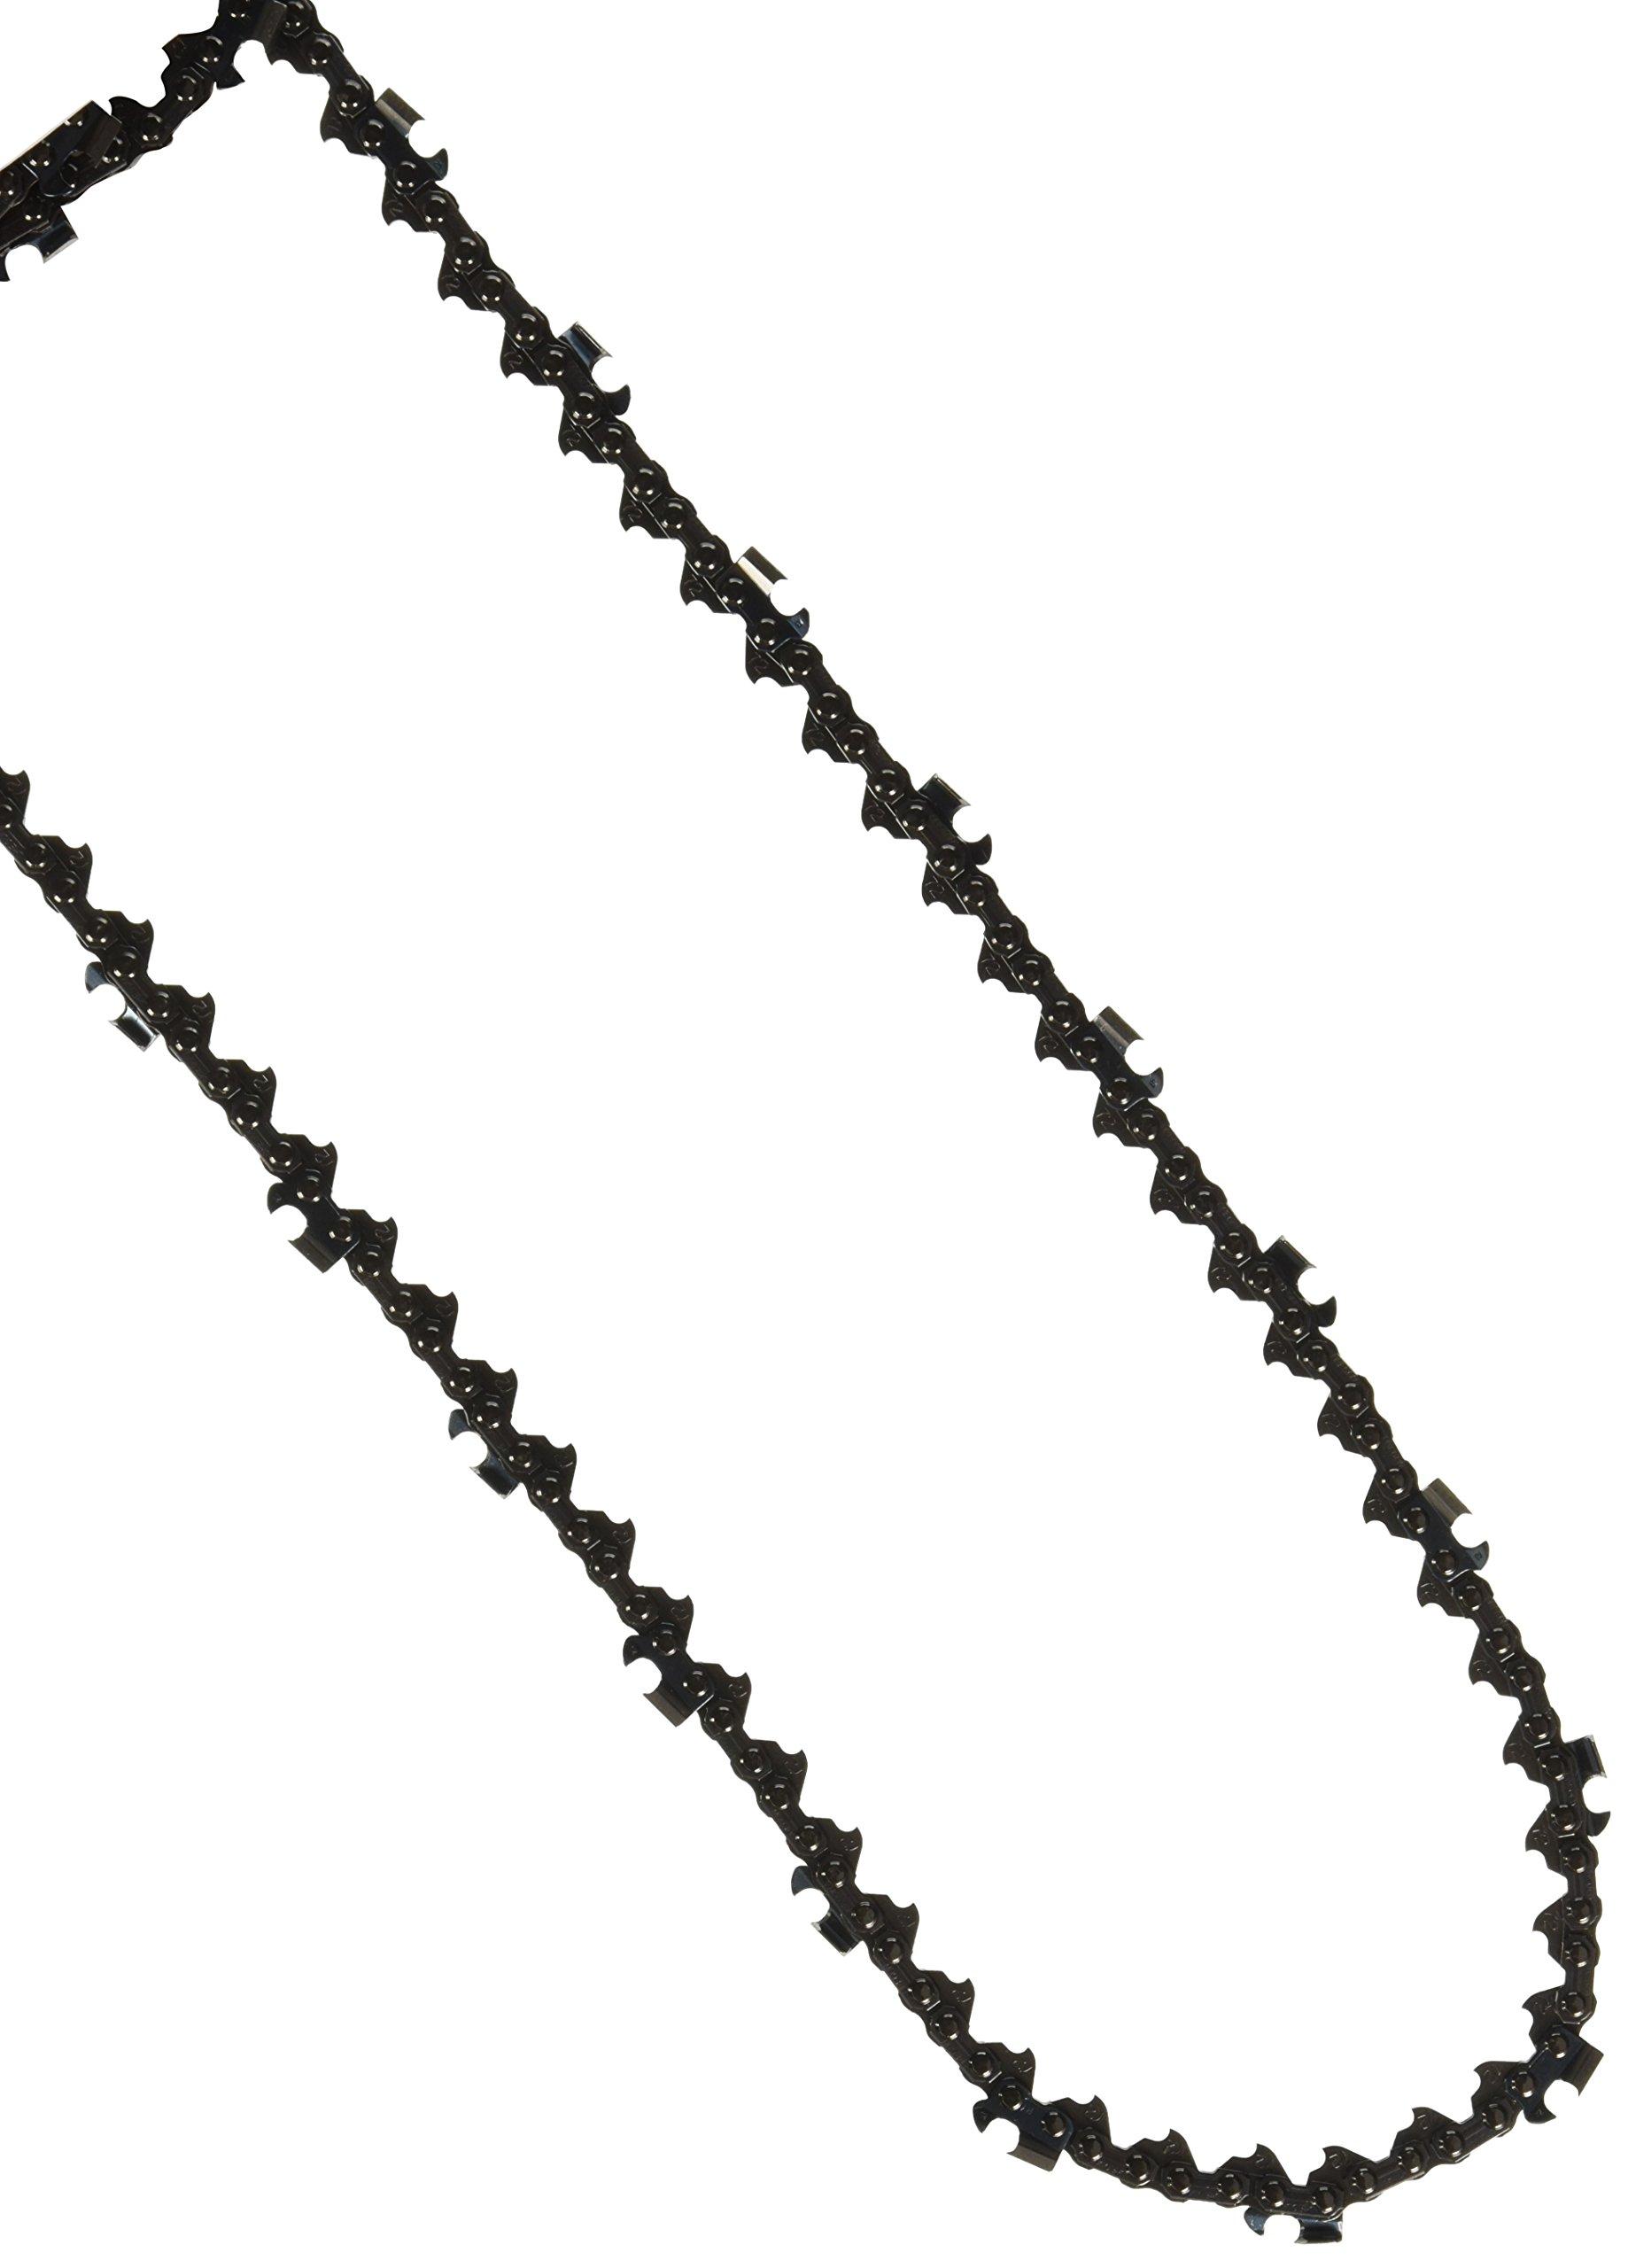 OREGON 72JGX025U 25-Feet Reel of Super Guard Skip Sequence Chain, 3/8-Inch